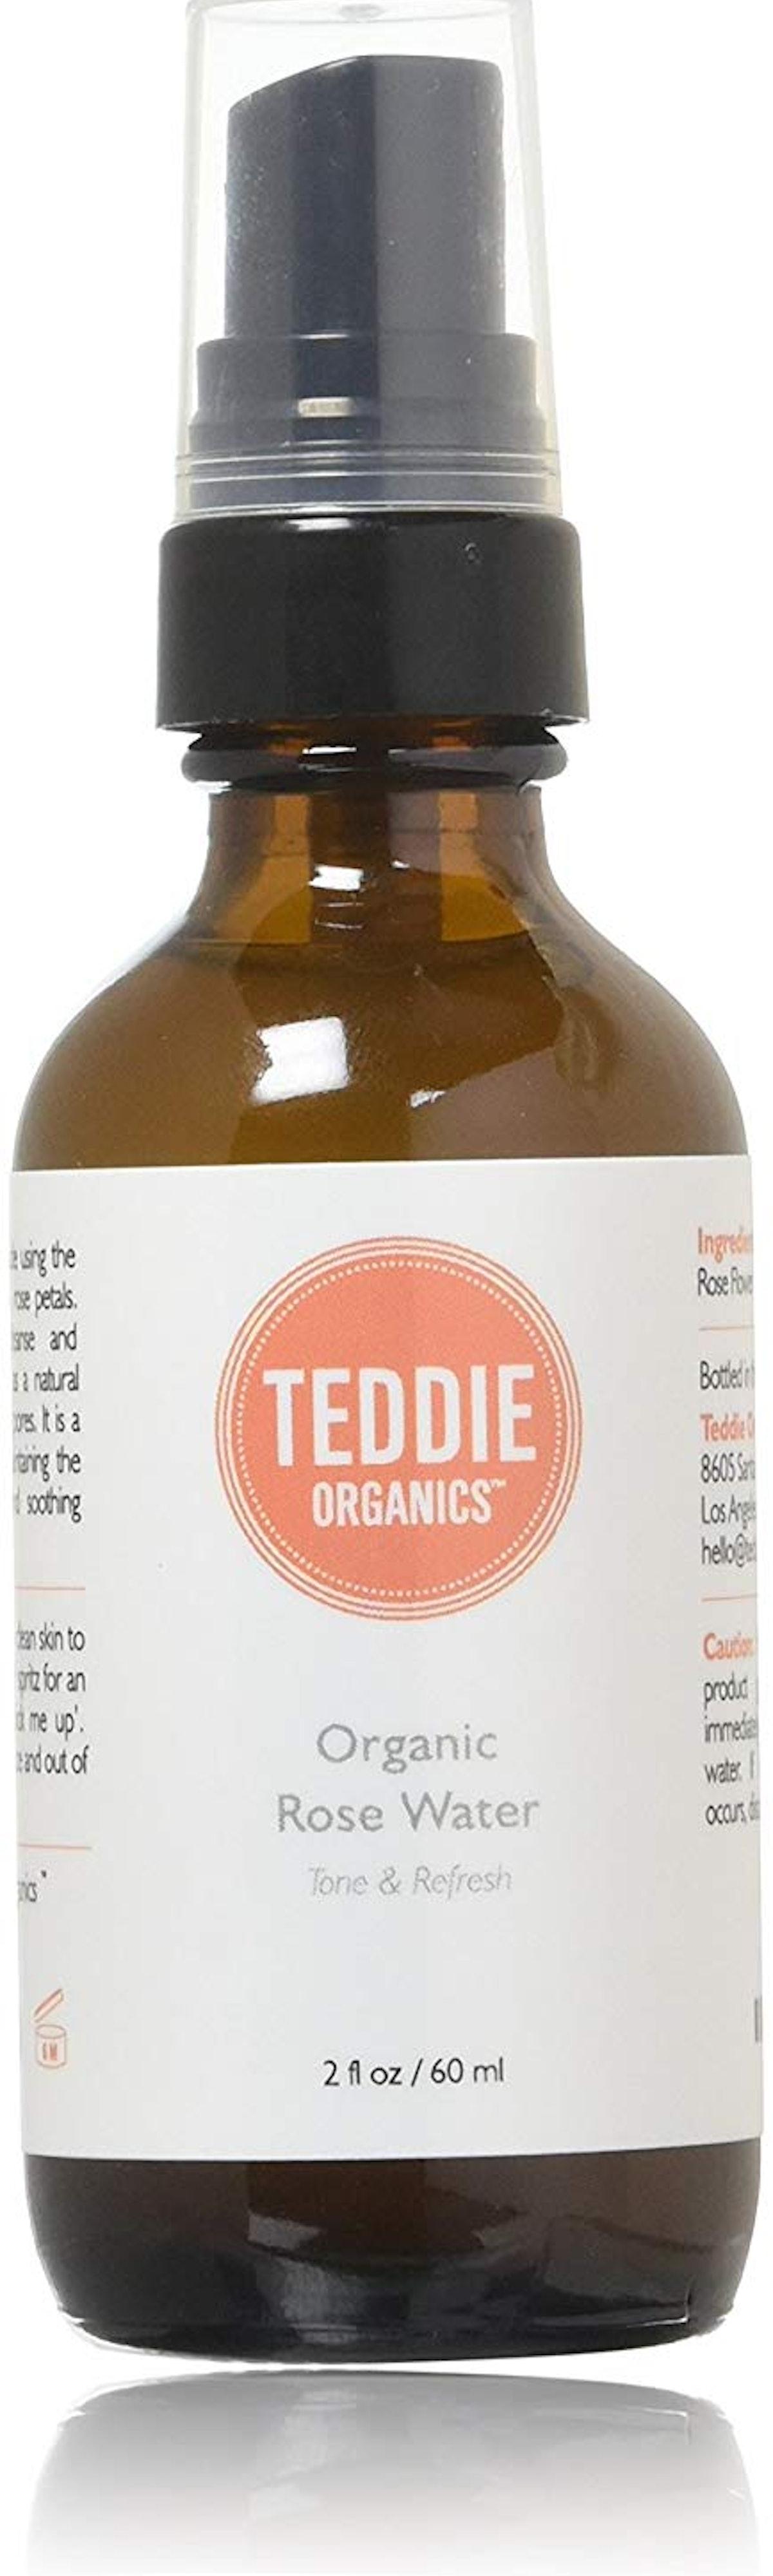 Teddie Organics Rose Water Toner Spray